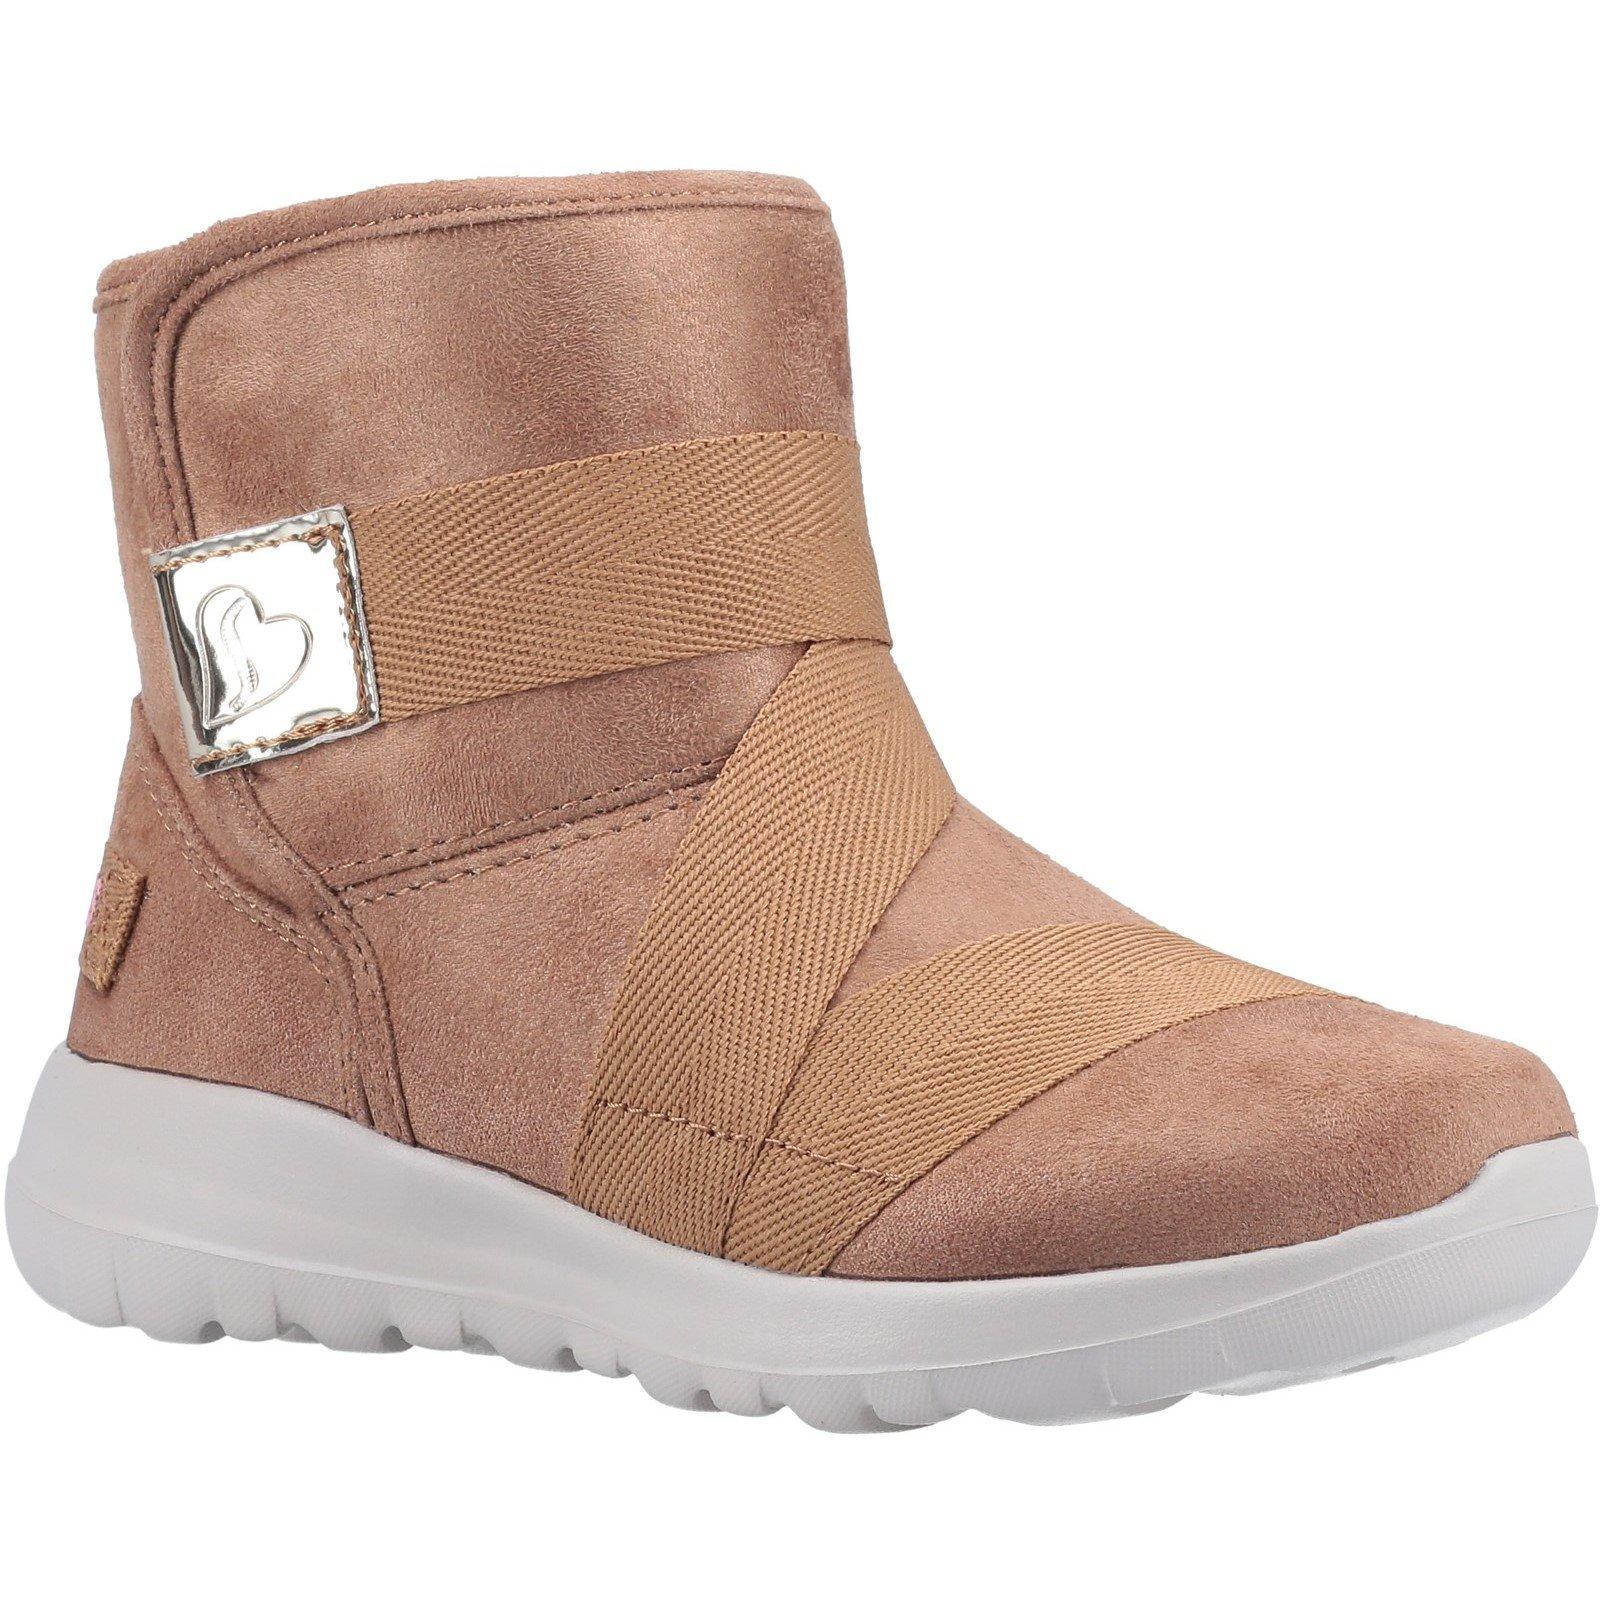 Skechers Unisex Go Walk Joy Strong Willed Ankle Boot Chestnut 31167 - Chestnut 2